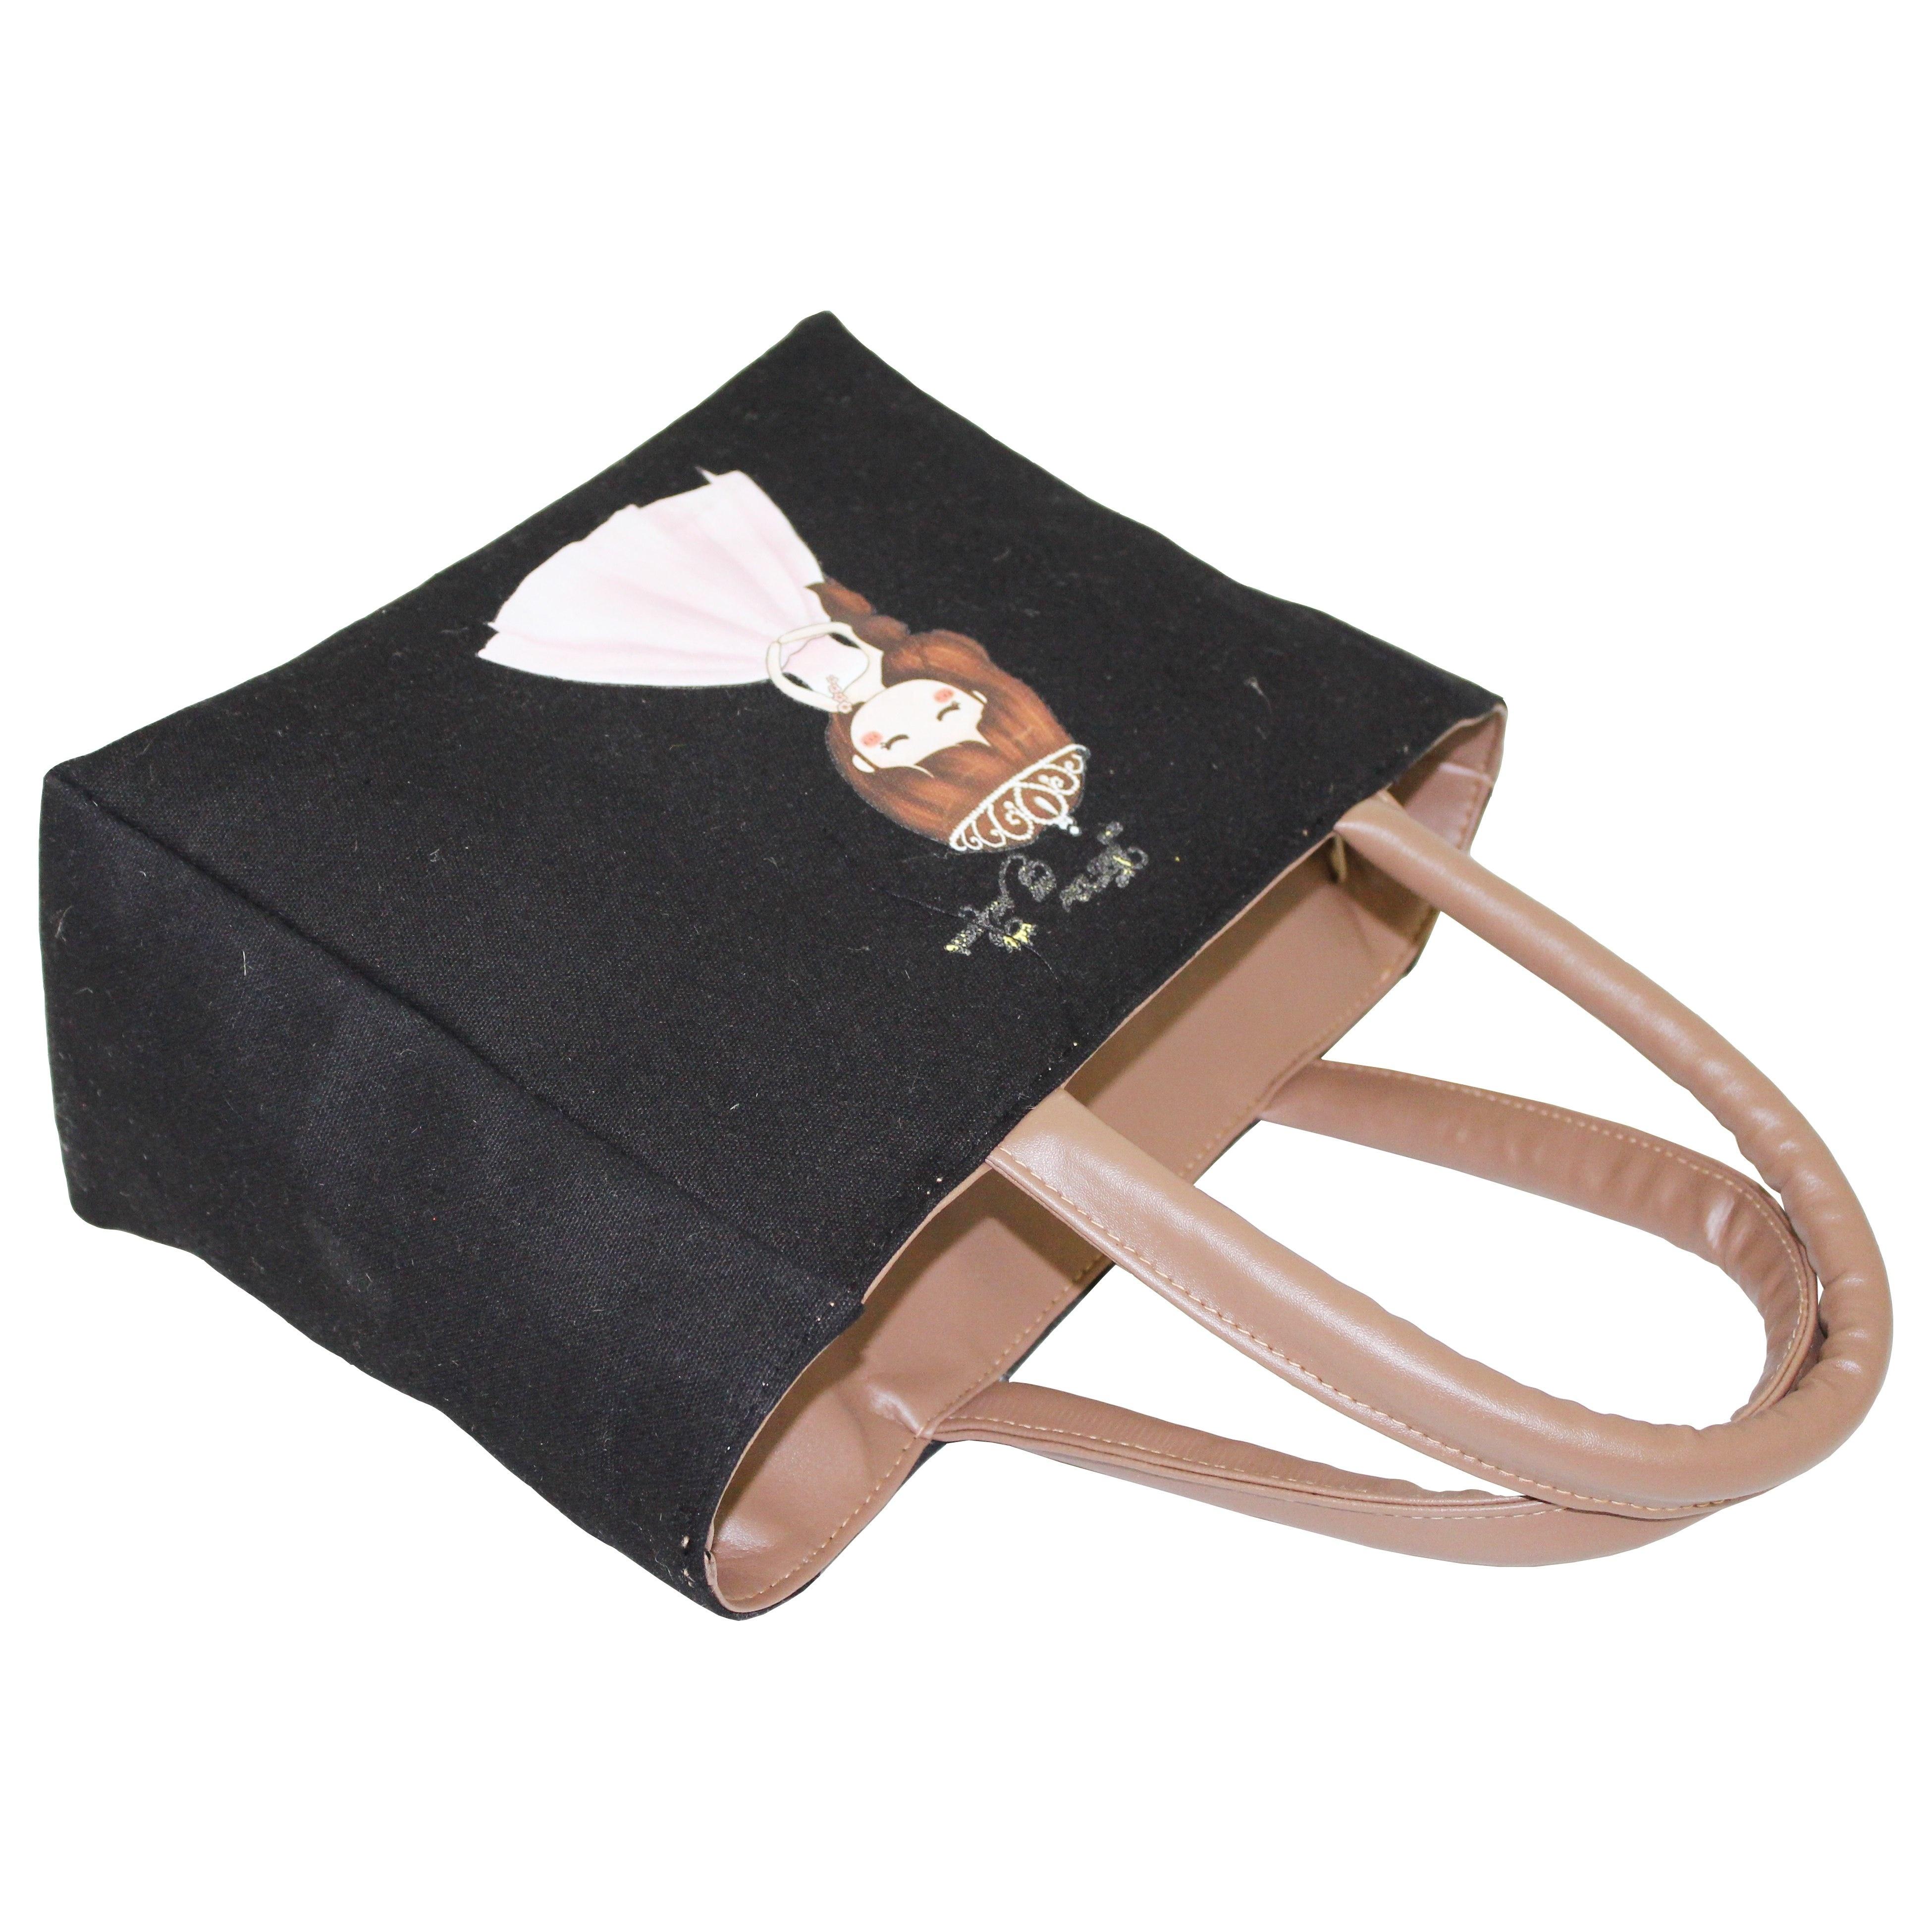 12 Oz Dyed Eva Padding Canvas Tote Bag